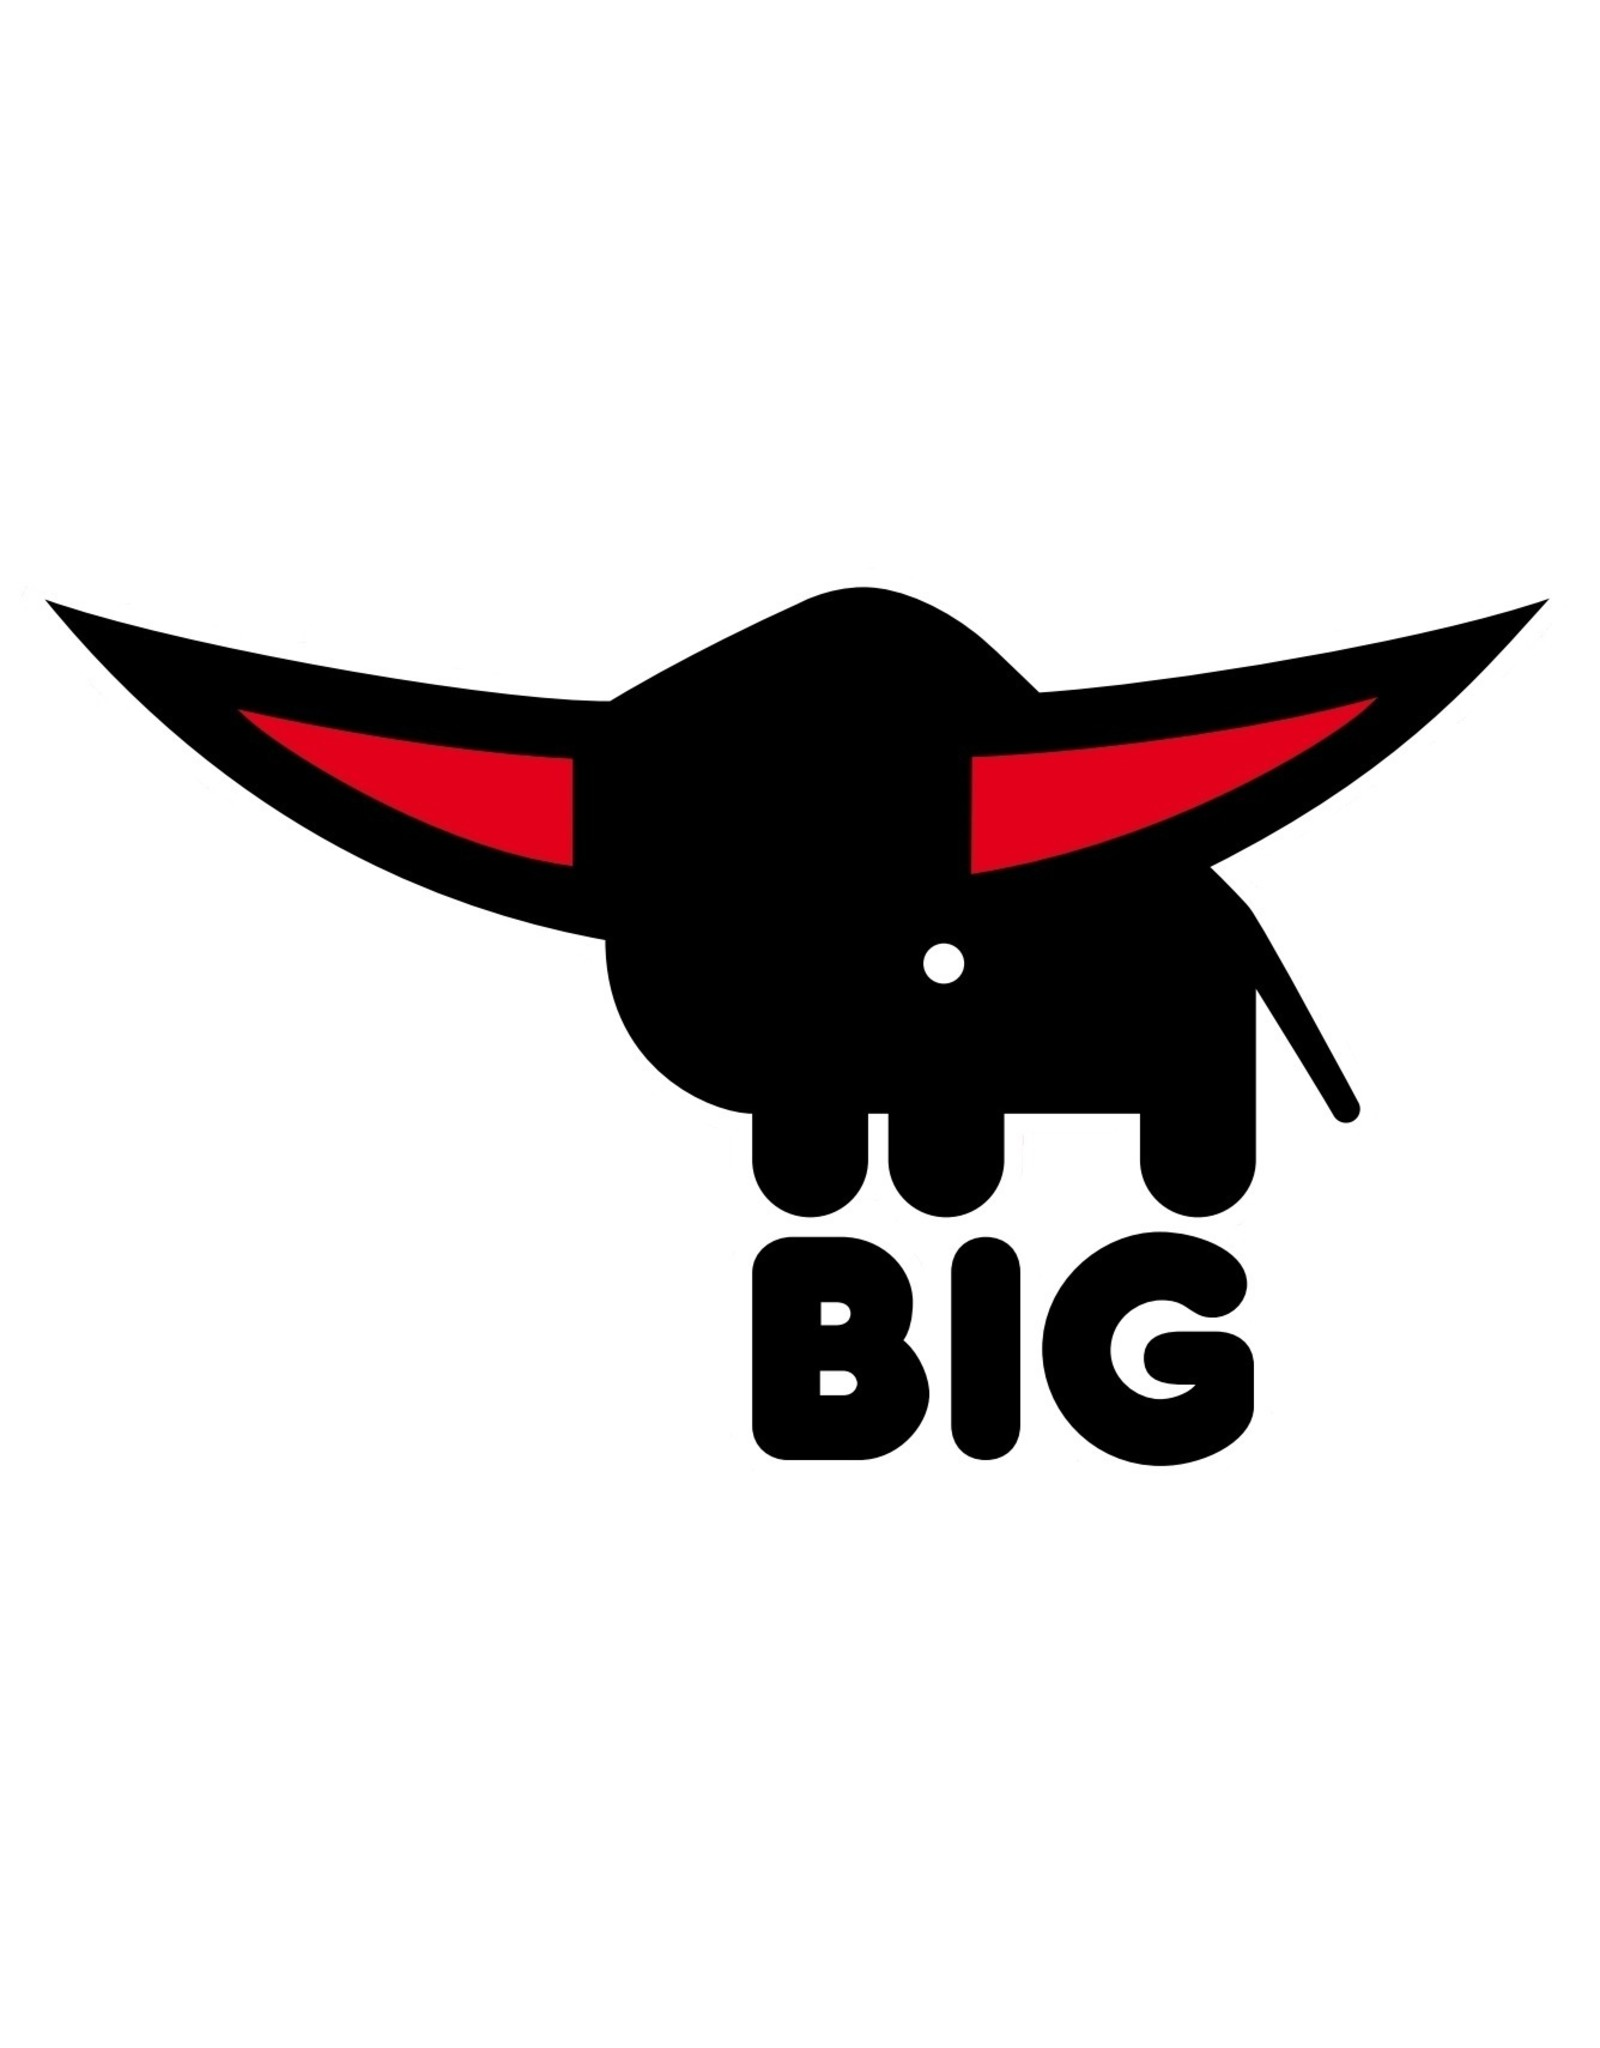 BIG BIG Power Worker Pick-up